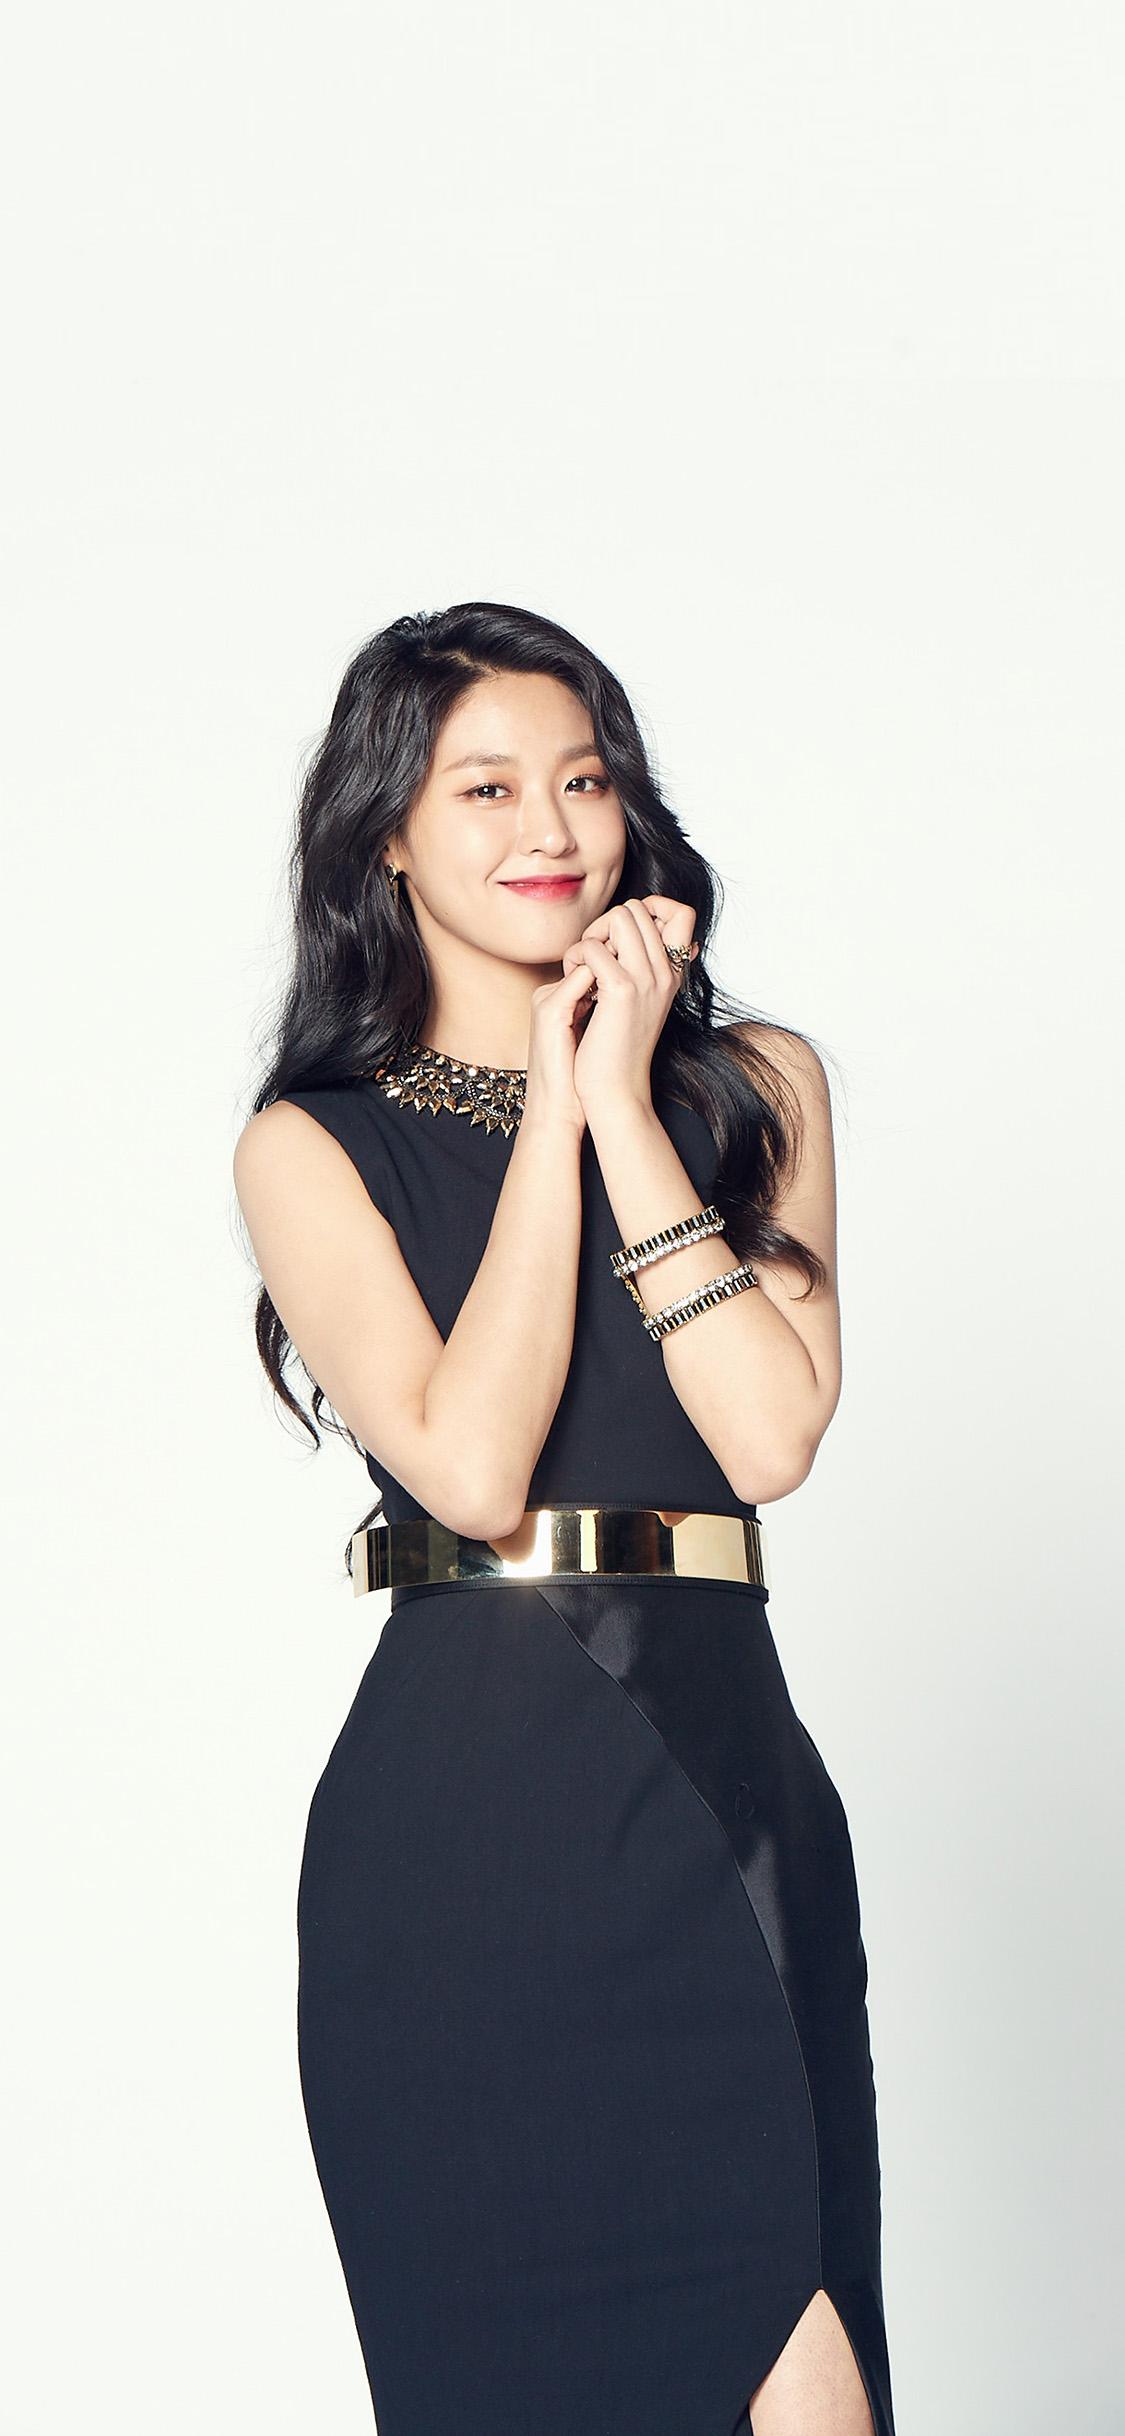 iPhonexpapers.com-Apple-iPhone-wallpaper-hr73-seolhyun-girl-kpop-smile-dress